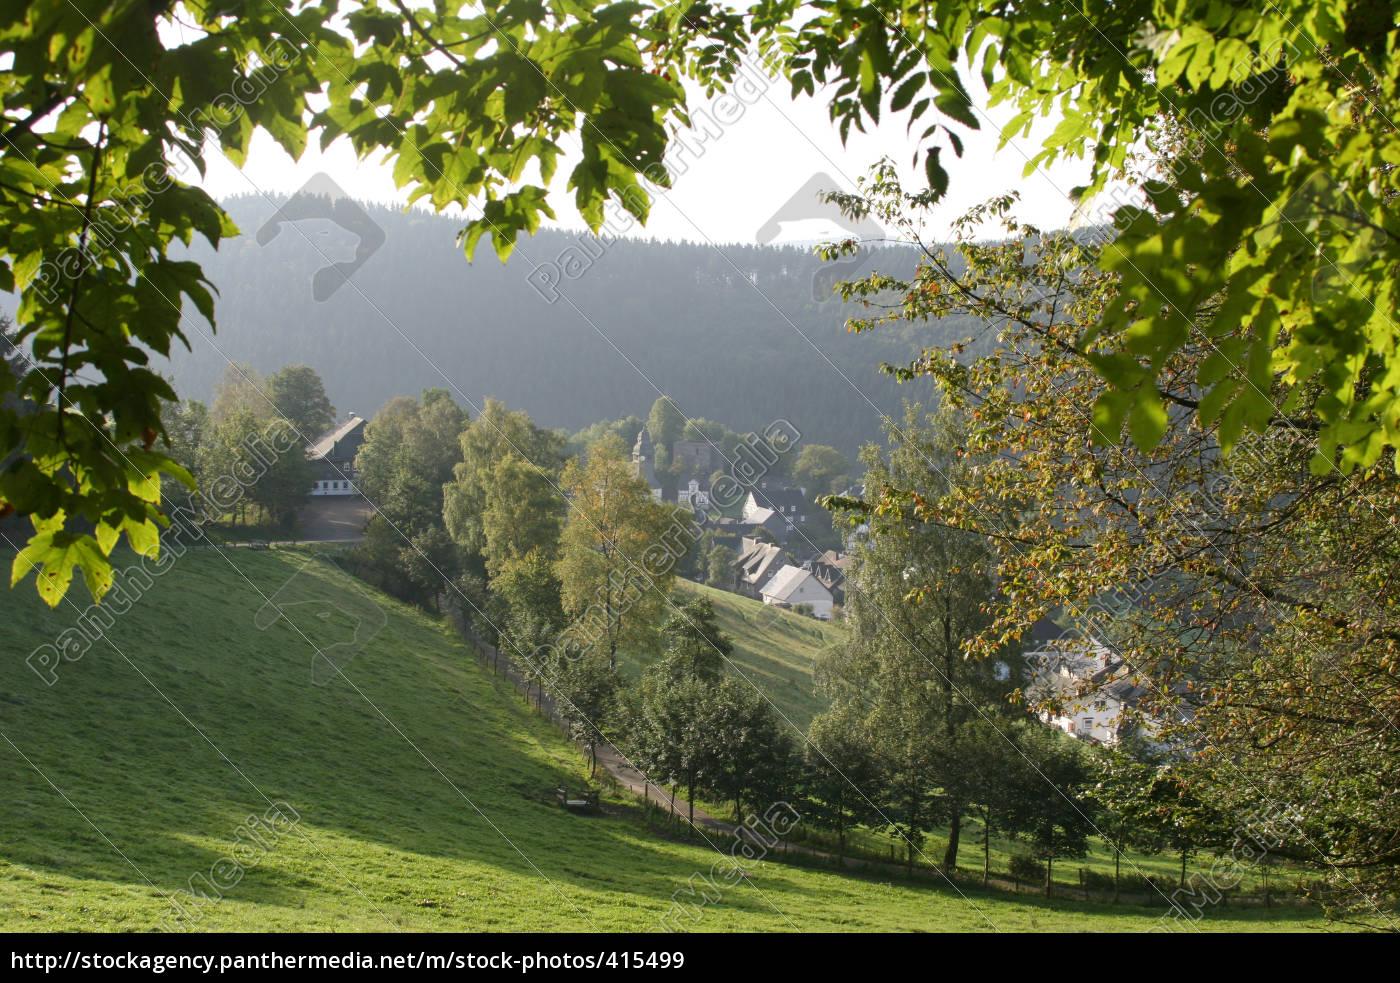 nordenau - 415499